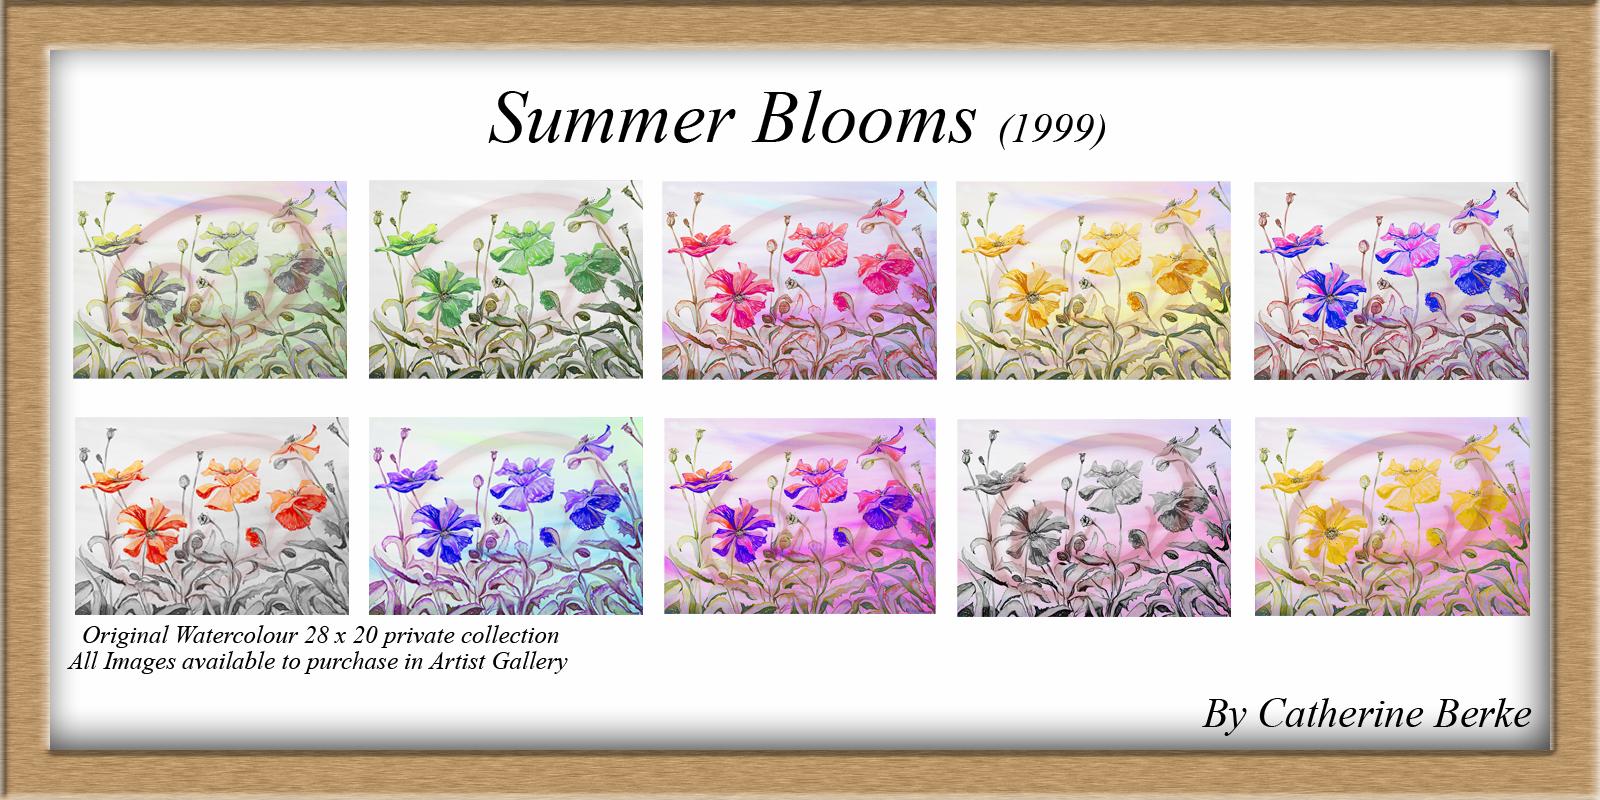 Summer Blooms Gallery